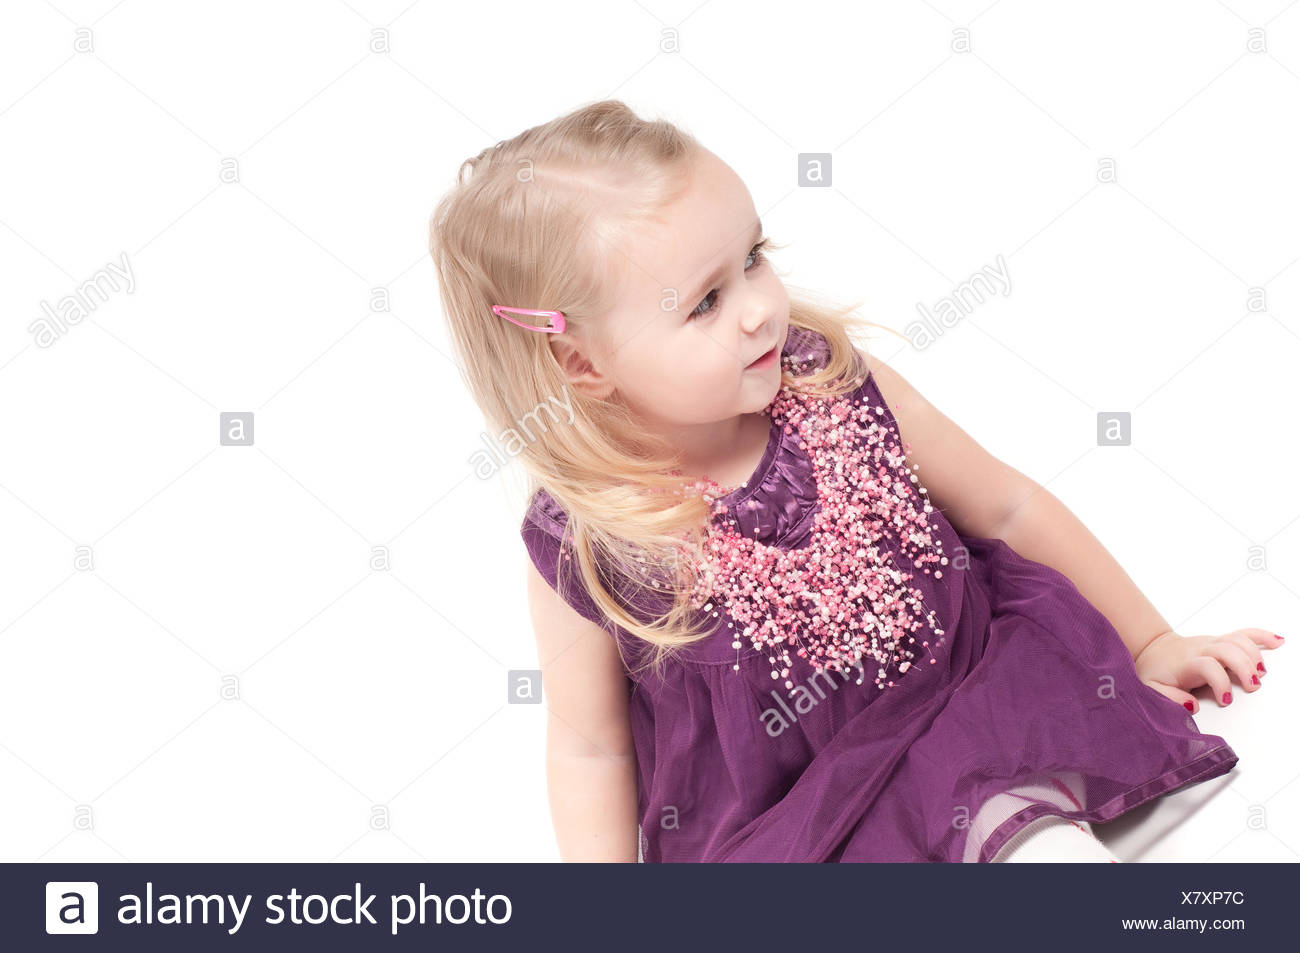 Cute Baby Girl In Violet Stock Photos Cute Baby Girl In Violet